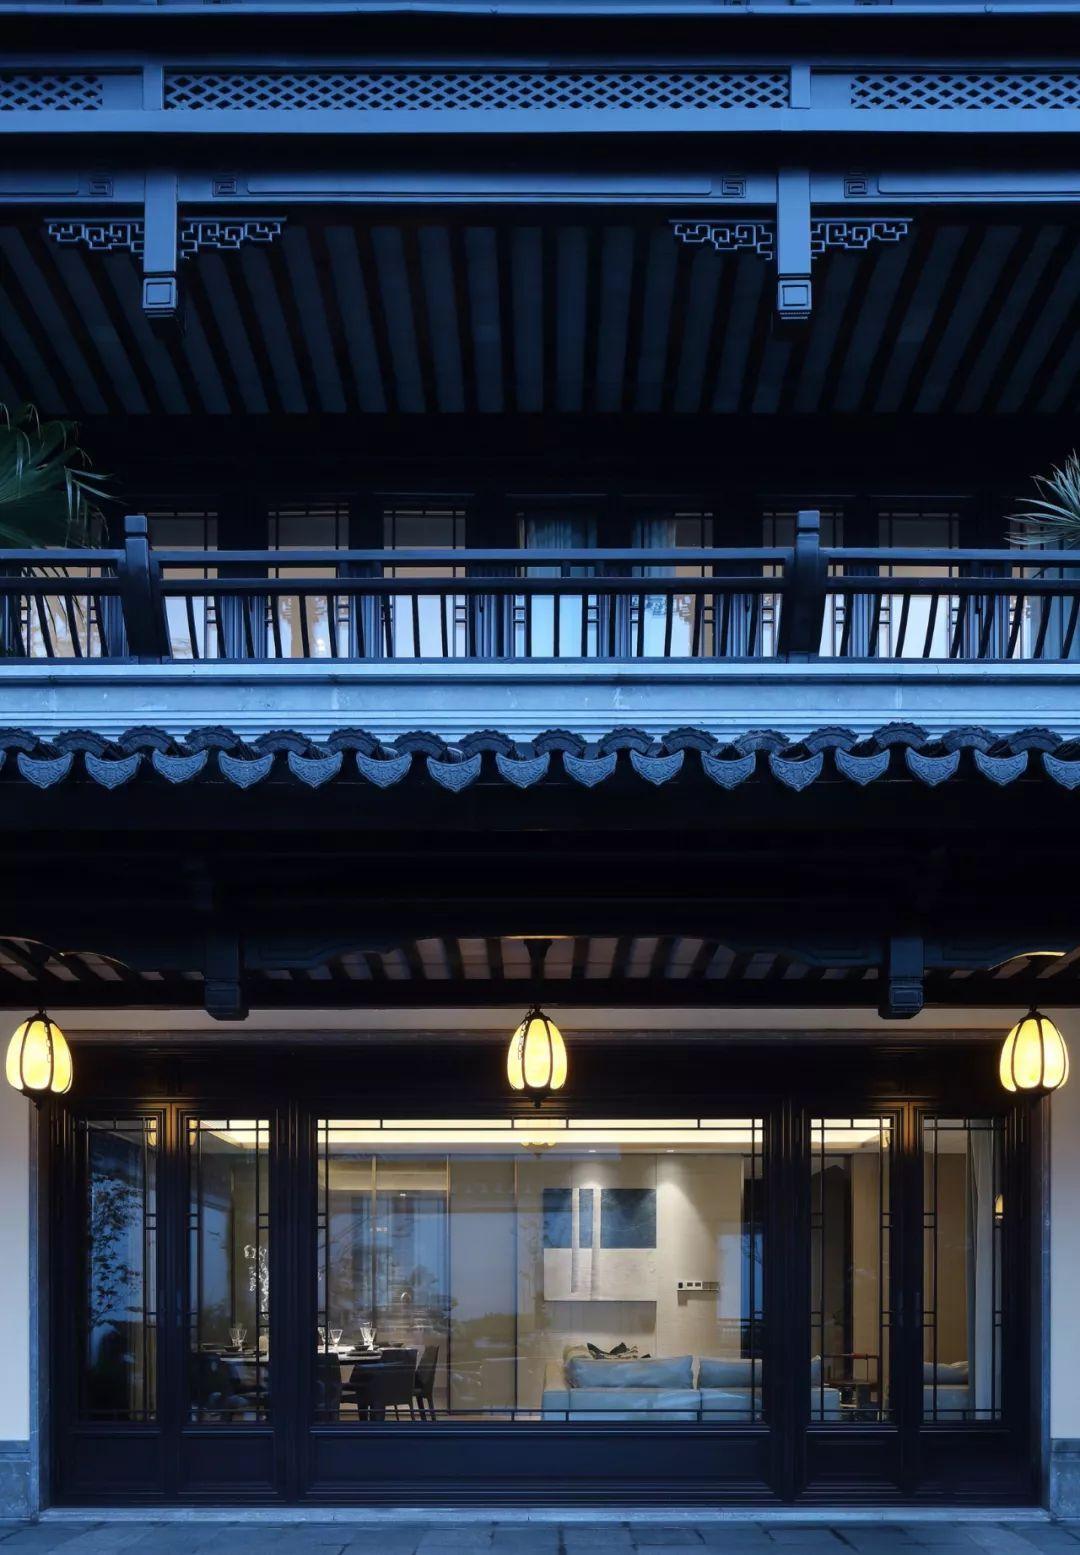 435.8m2杭州顶级合院,精致儒雅的东方美学智慧 | 矩阵纵横